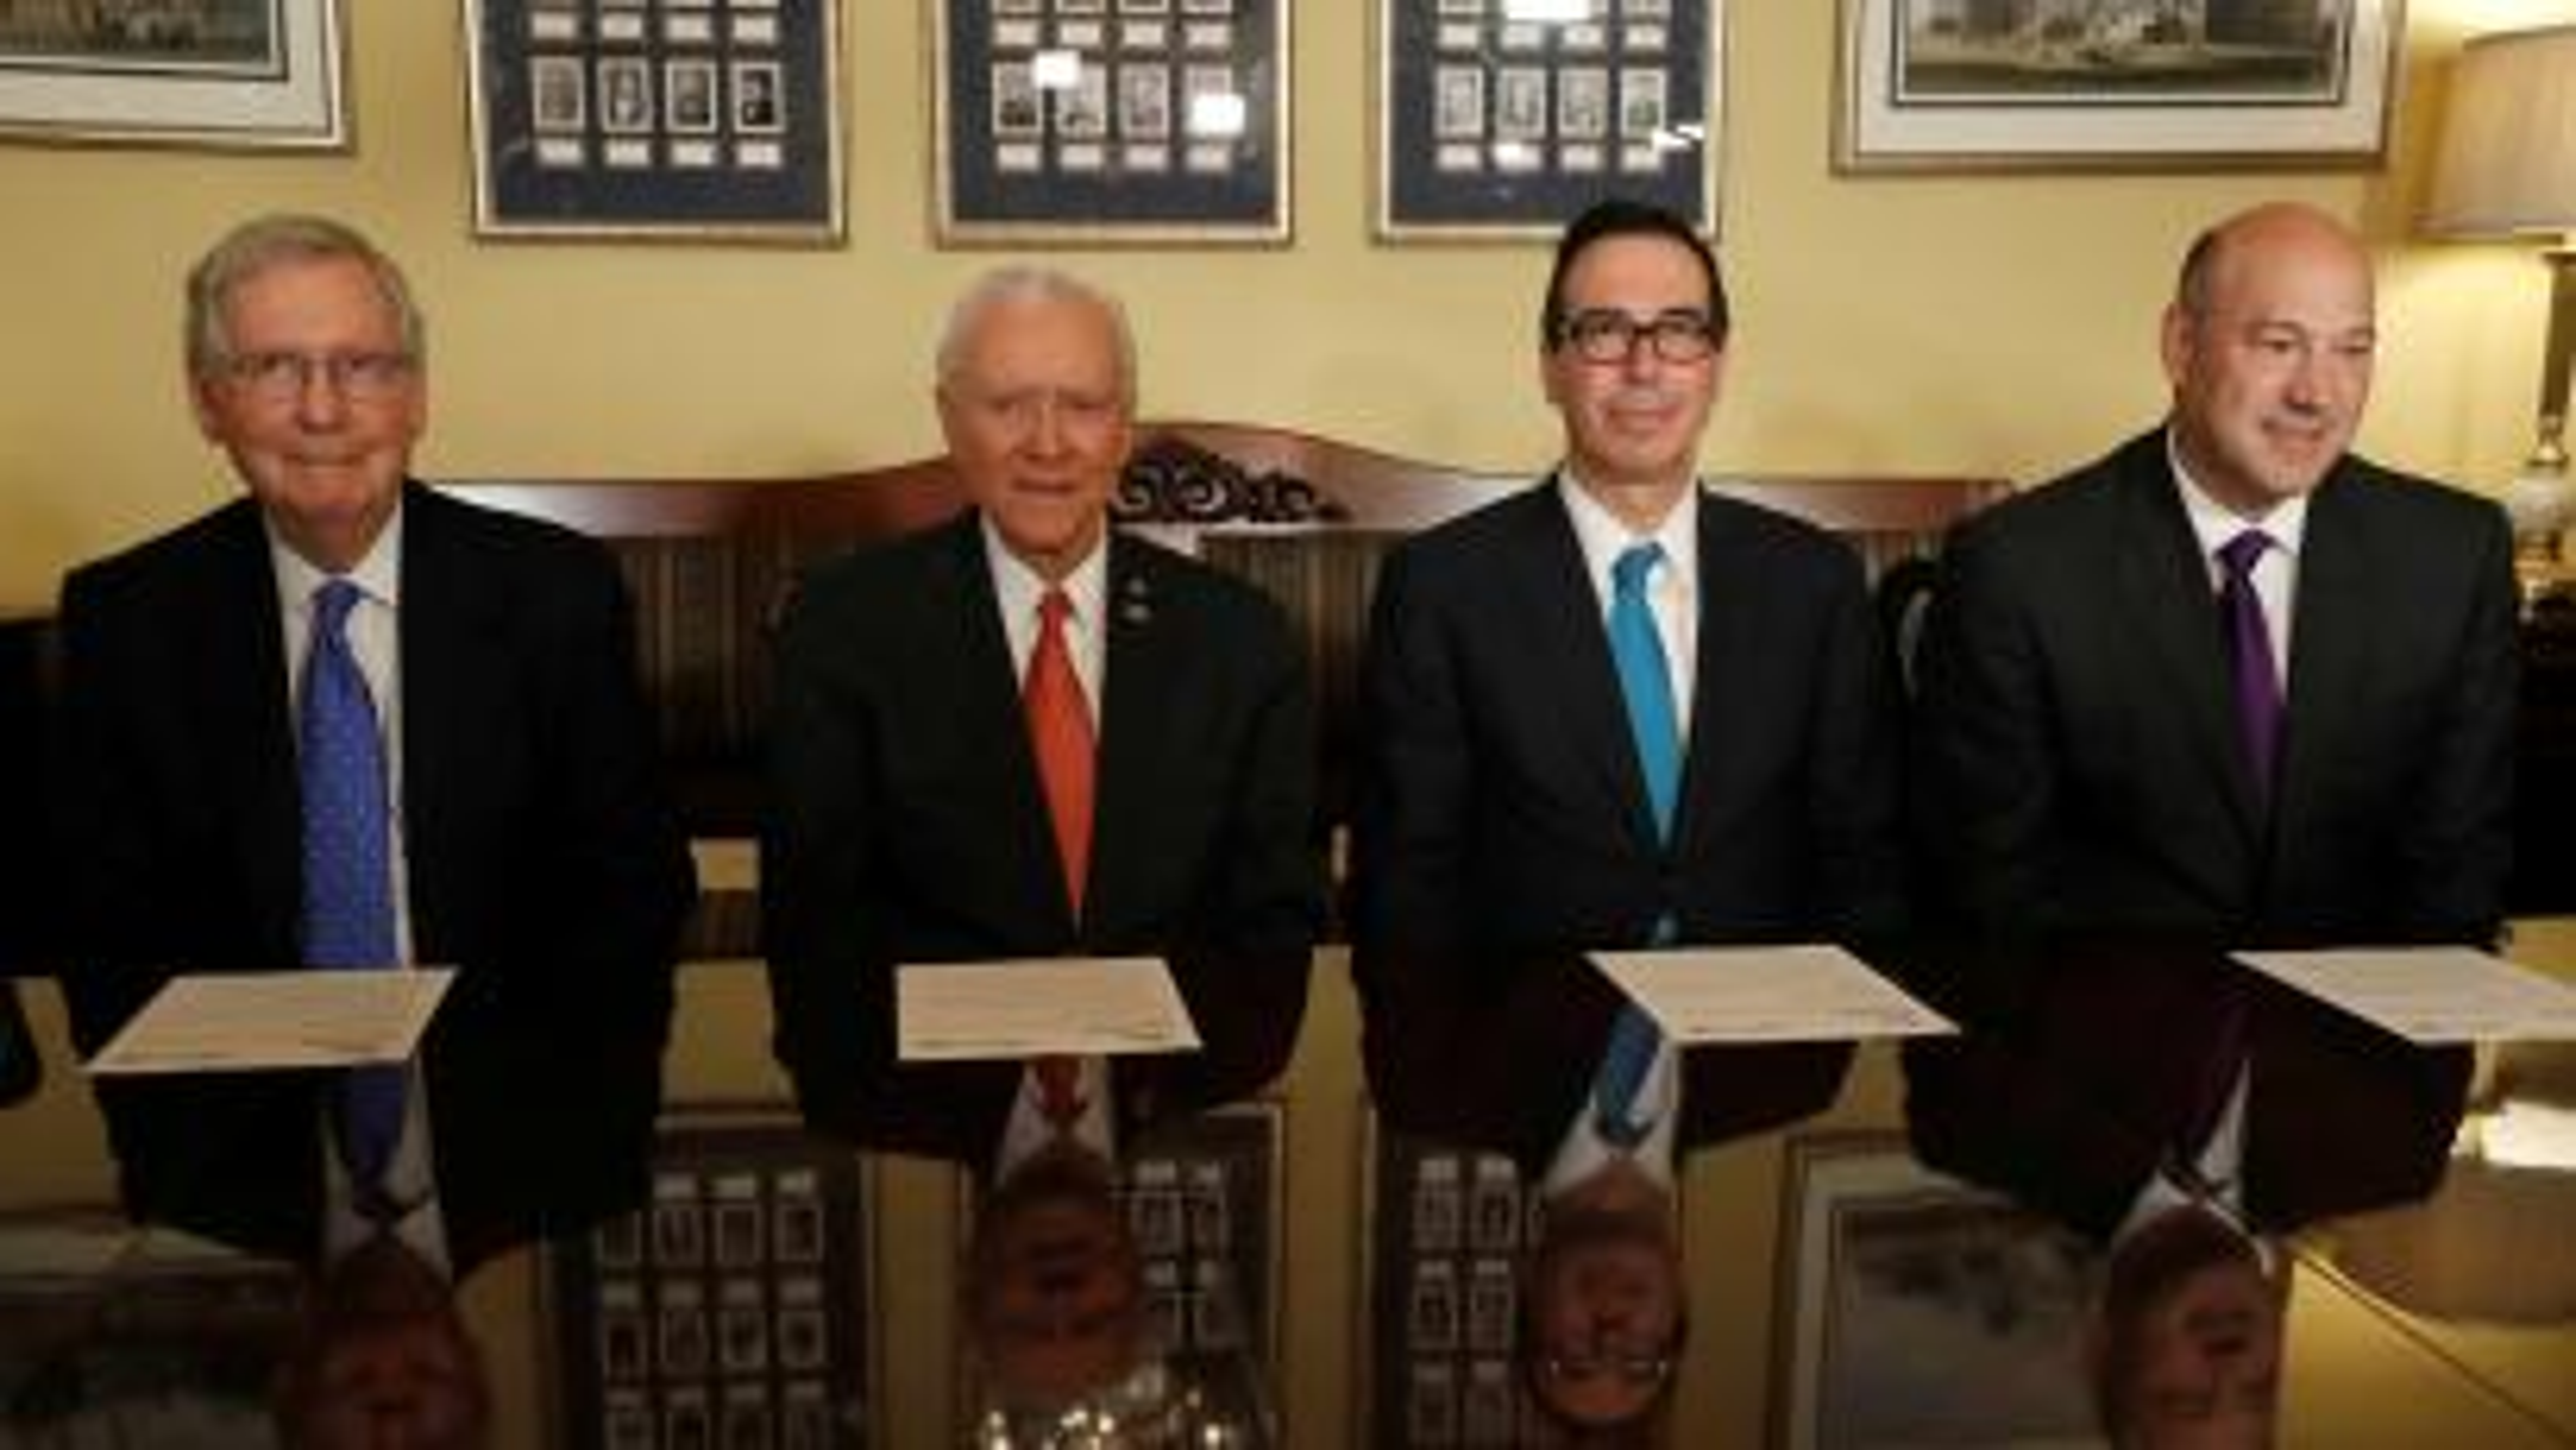 Senate Majority Leader Mitch McConnell, Sen. Orrin Hatch, Treasury Secretary Steve Mnuchin and Director of the National Economic Council Gary Cohn introduce the Republican tax reform plan at the U.S. Capitol in Washington, U.S., November 9, 2017.